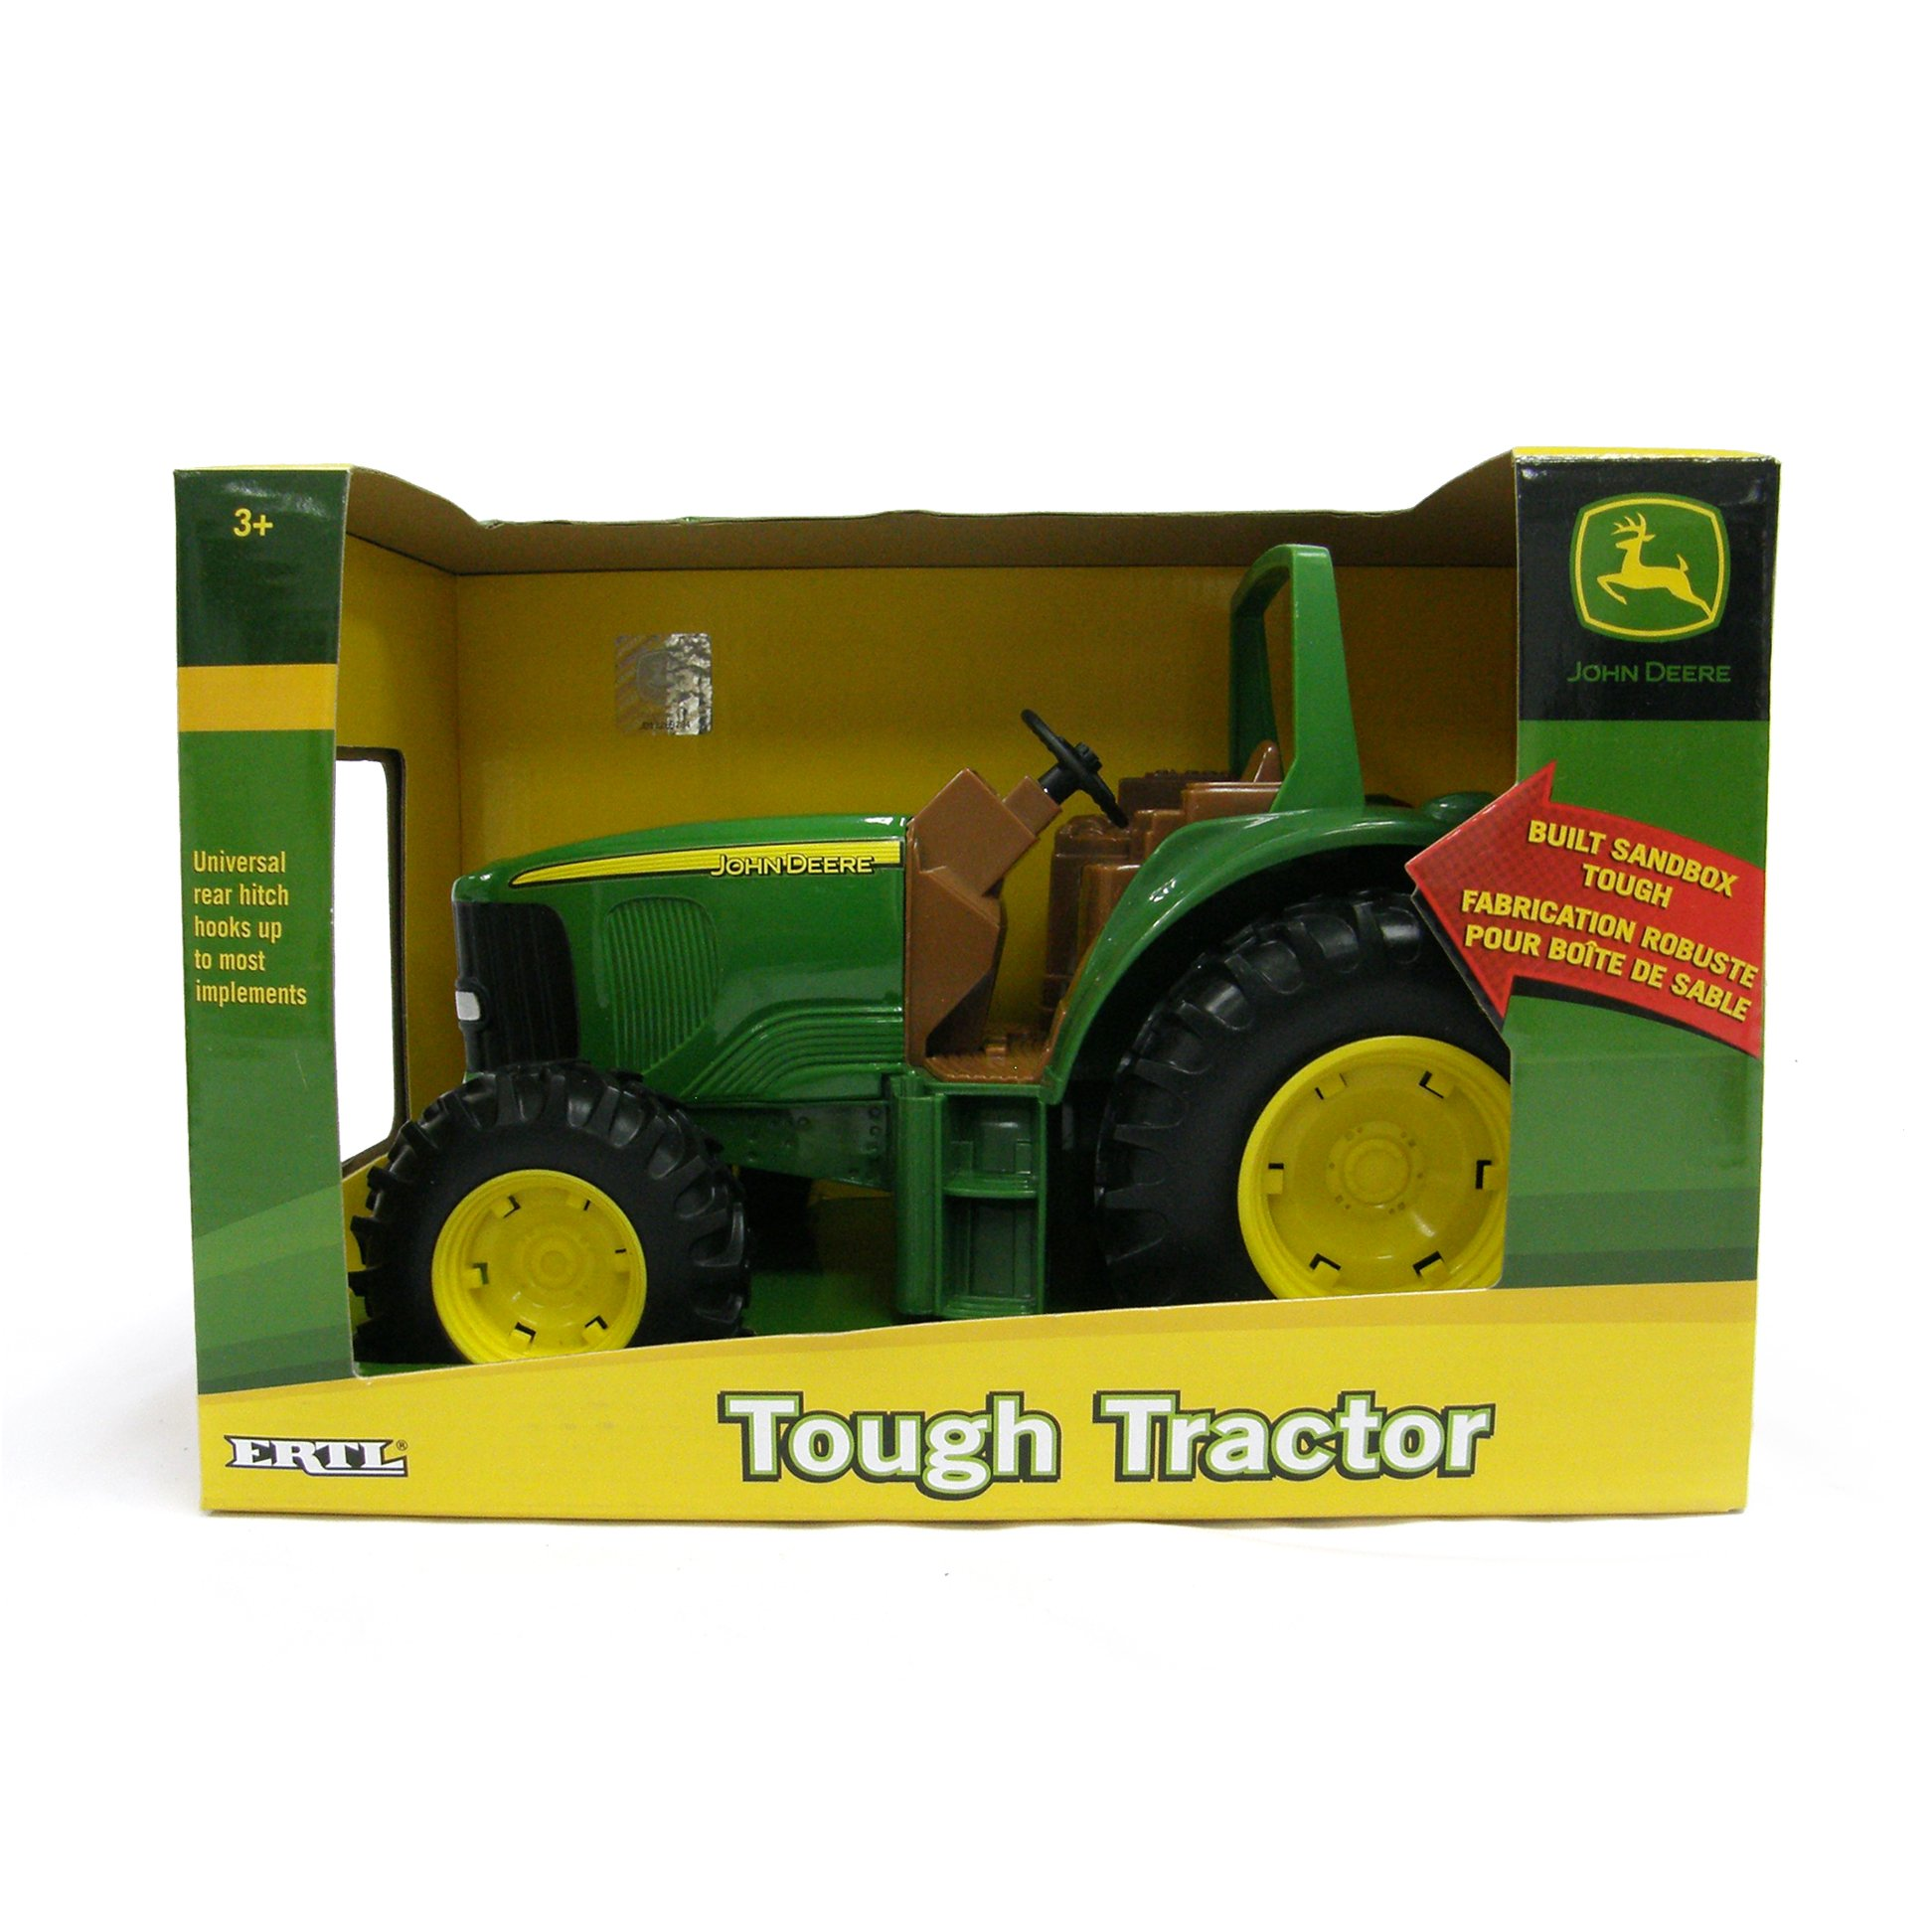 11'' John Deere Tough Tractor